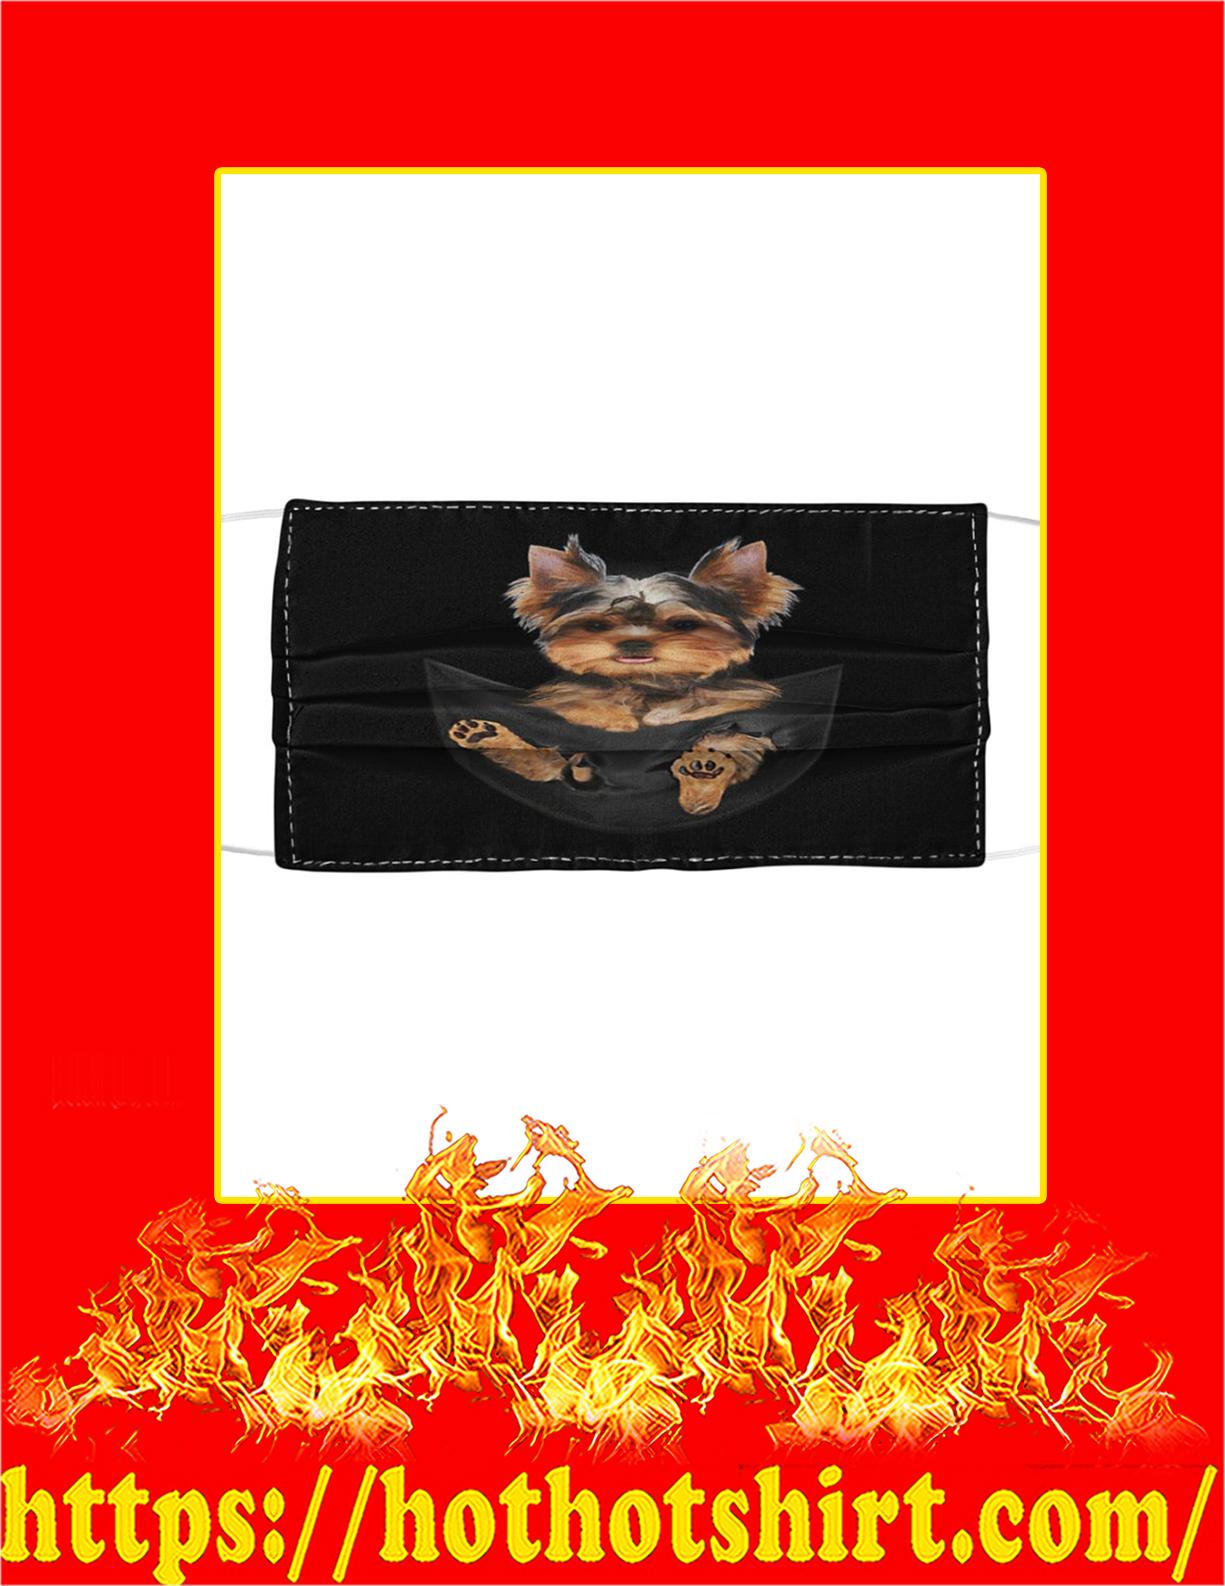 Yorkshire terrier in pocket cloth face mask - detail